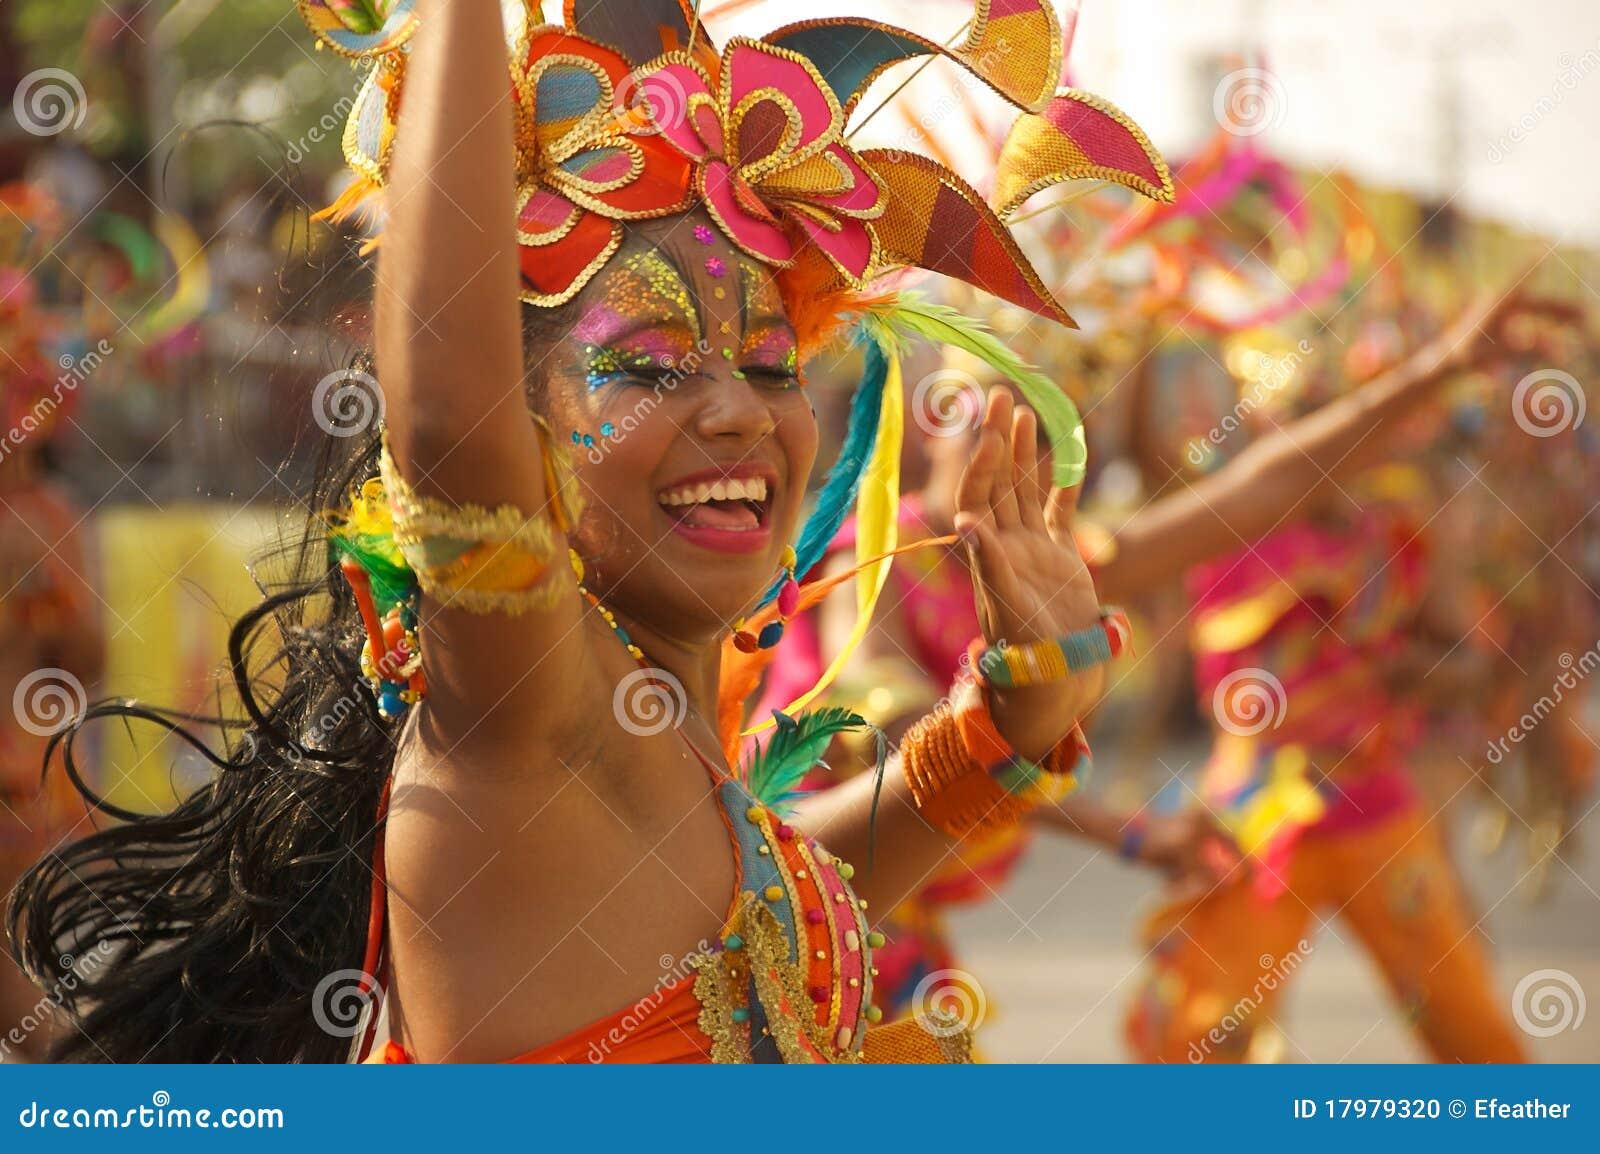 Carnival parade in Barranquilla, Colombia